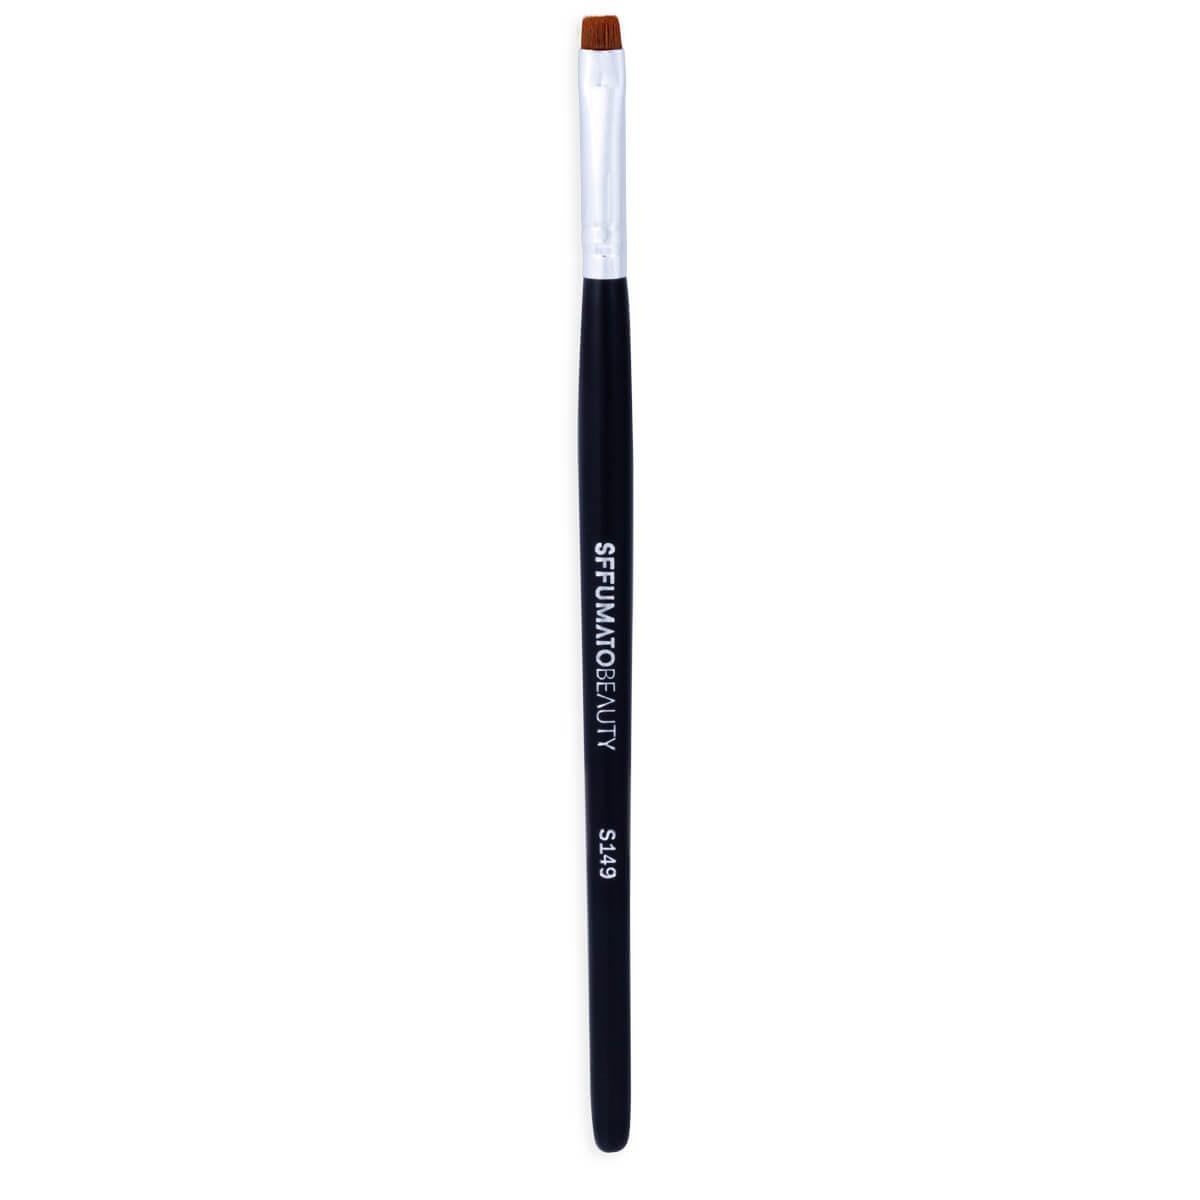 S149 - Pincel Para Delinear Pequeno Profissional Sffumato Beauty